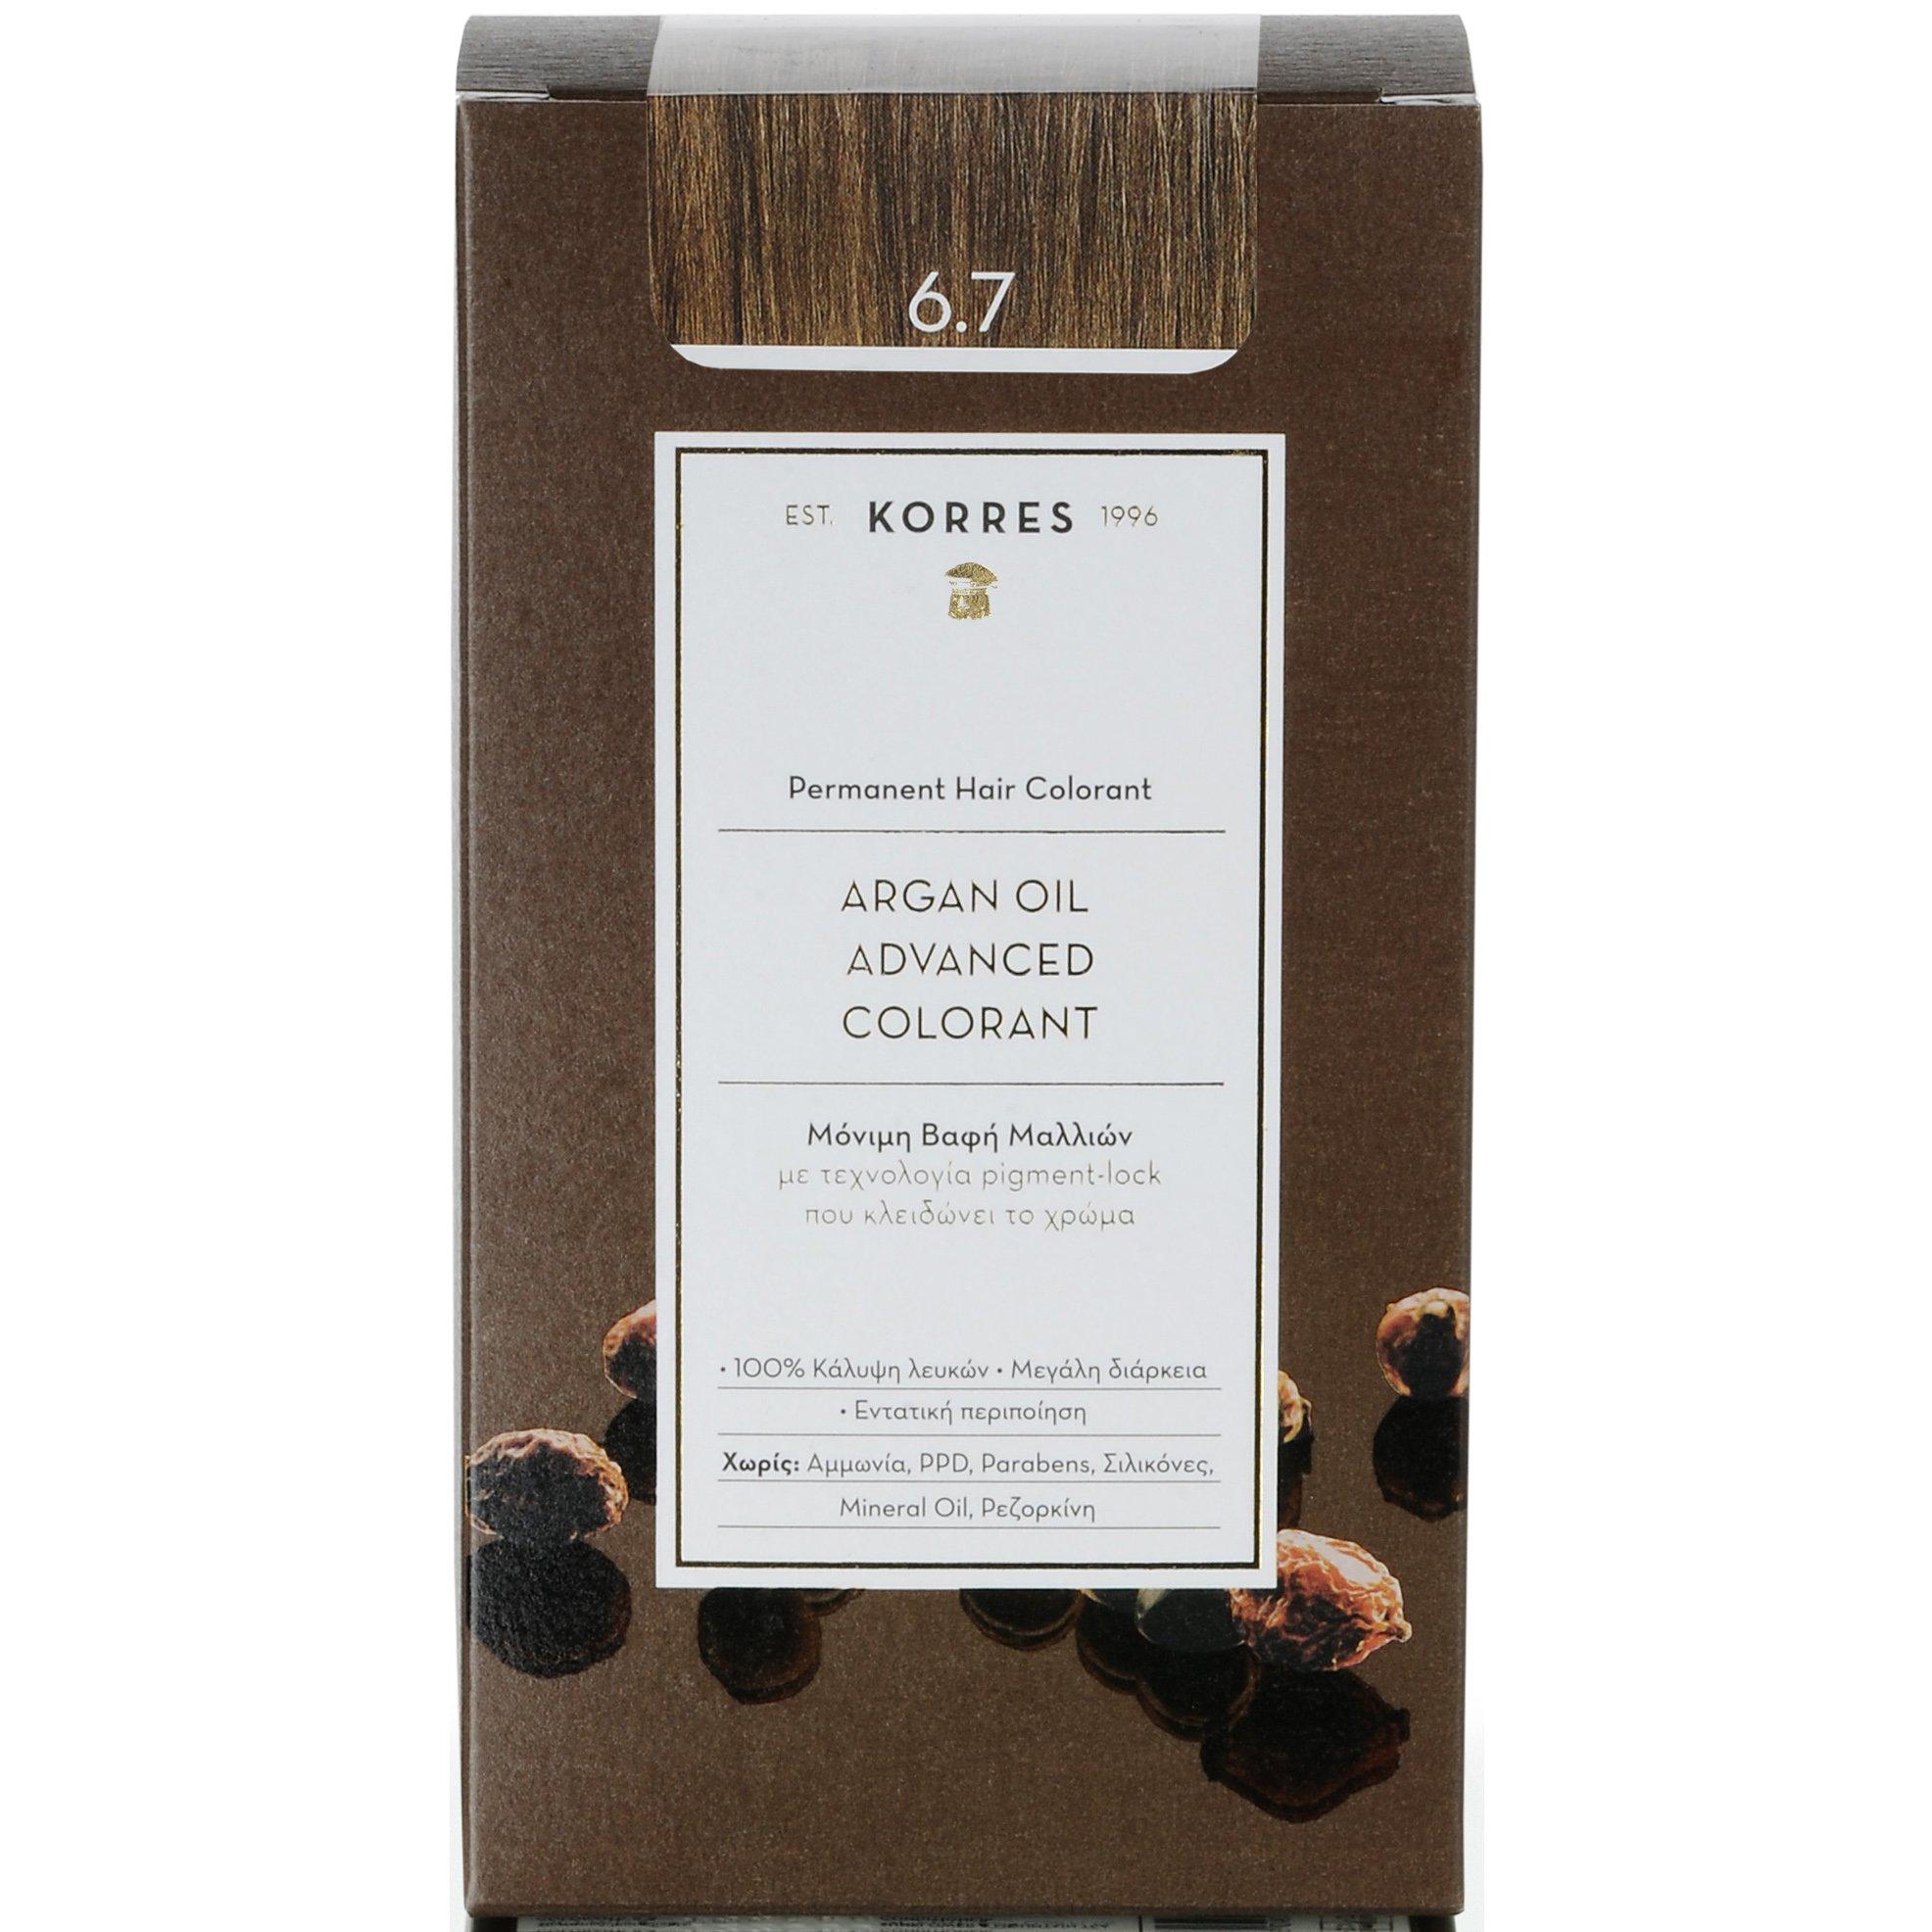 Korres Argan Oil Advanced Colorant Μόνιμη Βαφή Μαλλιών με Τεχνολογία Pigment-Lock που Κλειδώνει το Χρώμα 50ml – 6.7 ΚΑΚΑΟ